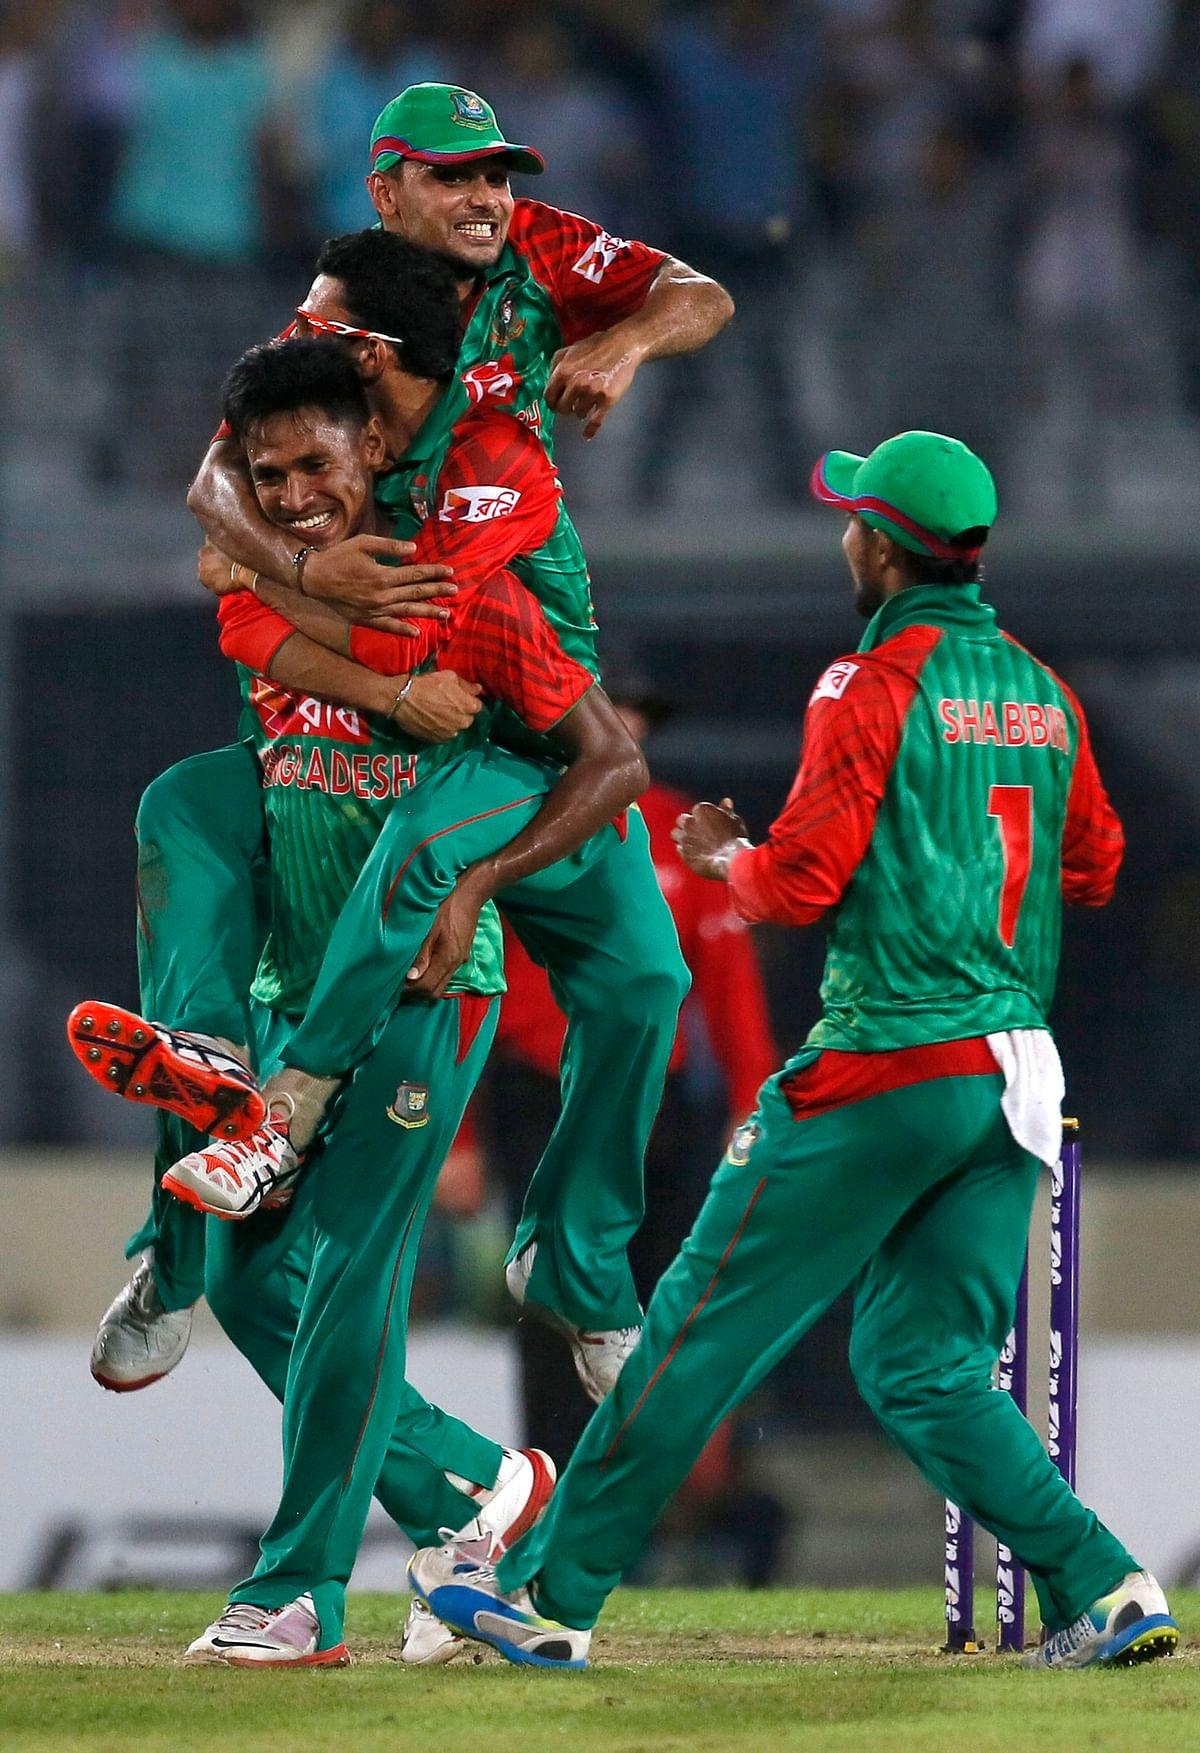 File photo of the Bangladesh team celebrating with Mustafizur Rahman on his ODI debut against India. (Photo: AP)